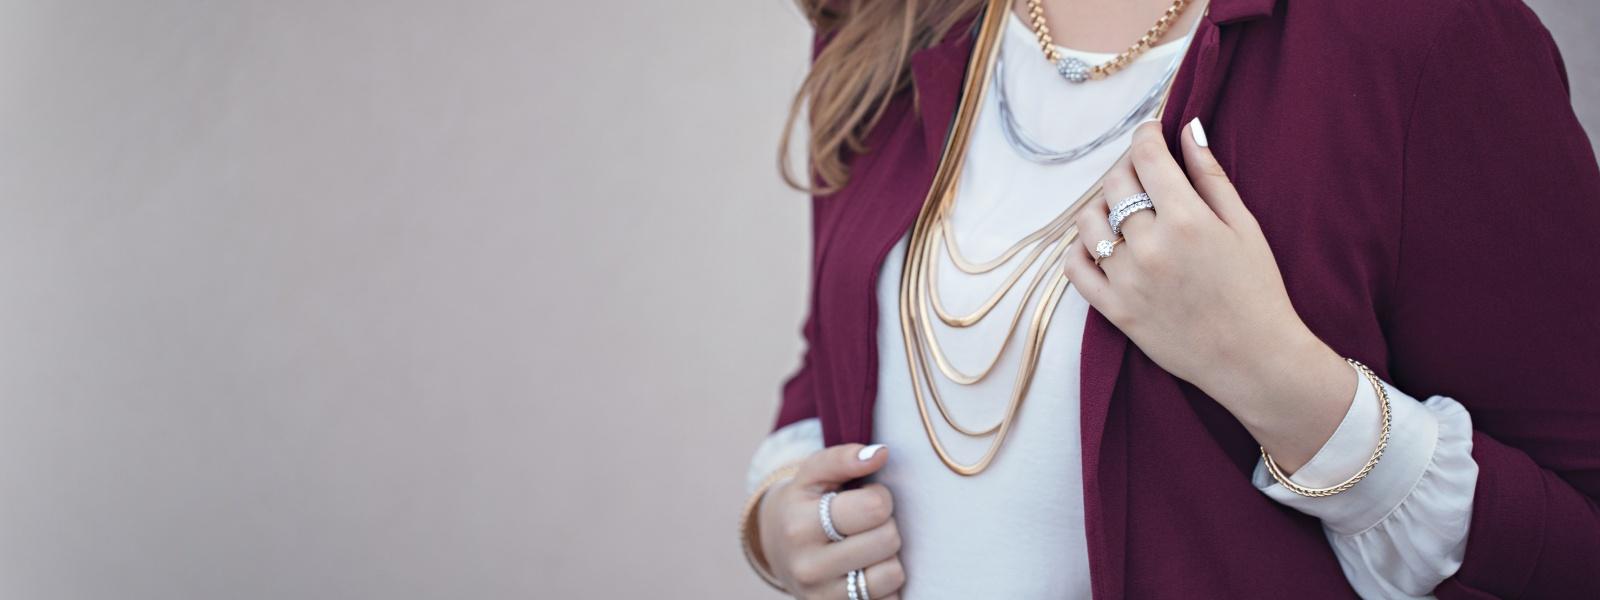 Bold basic jewelry